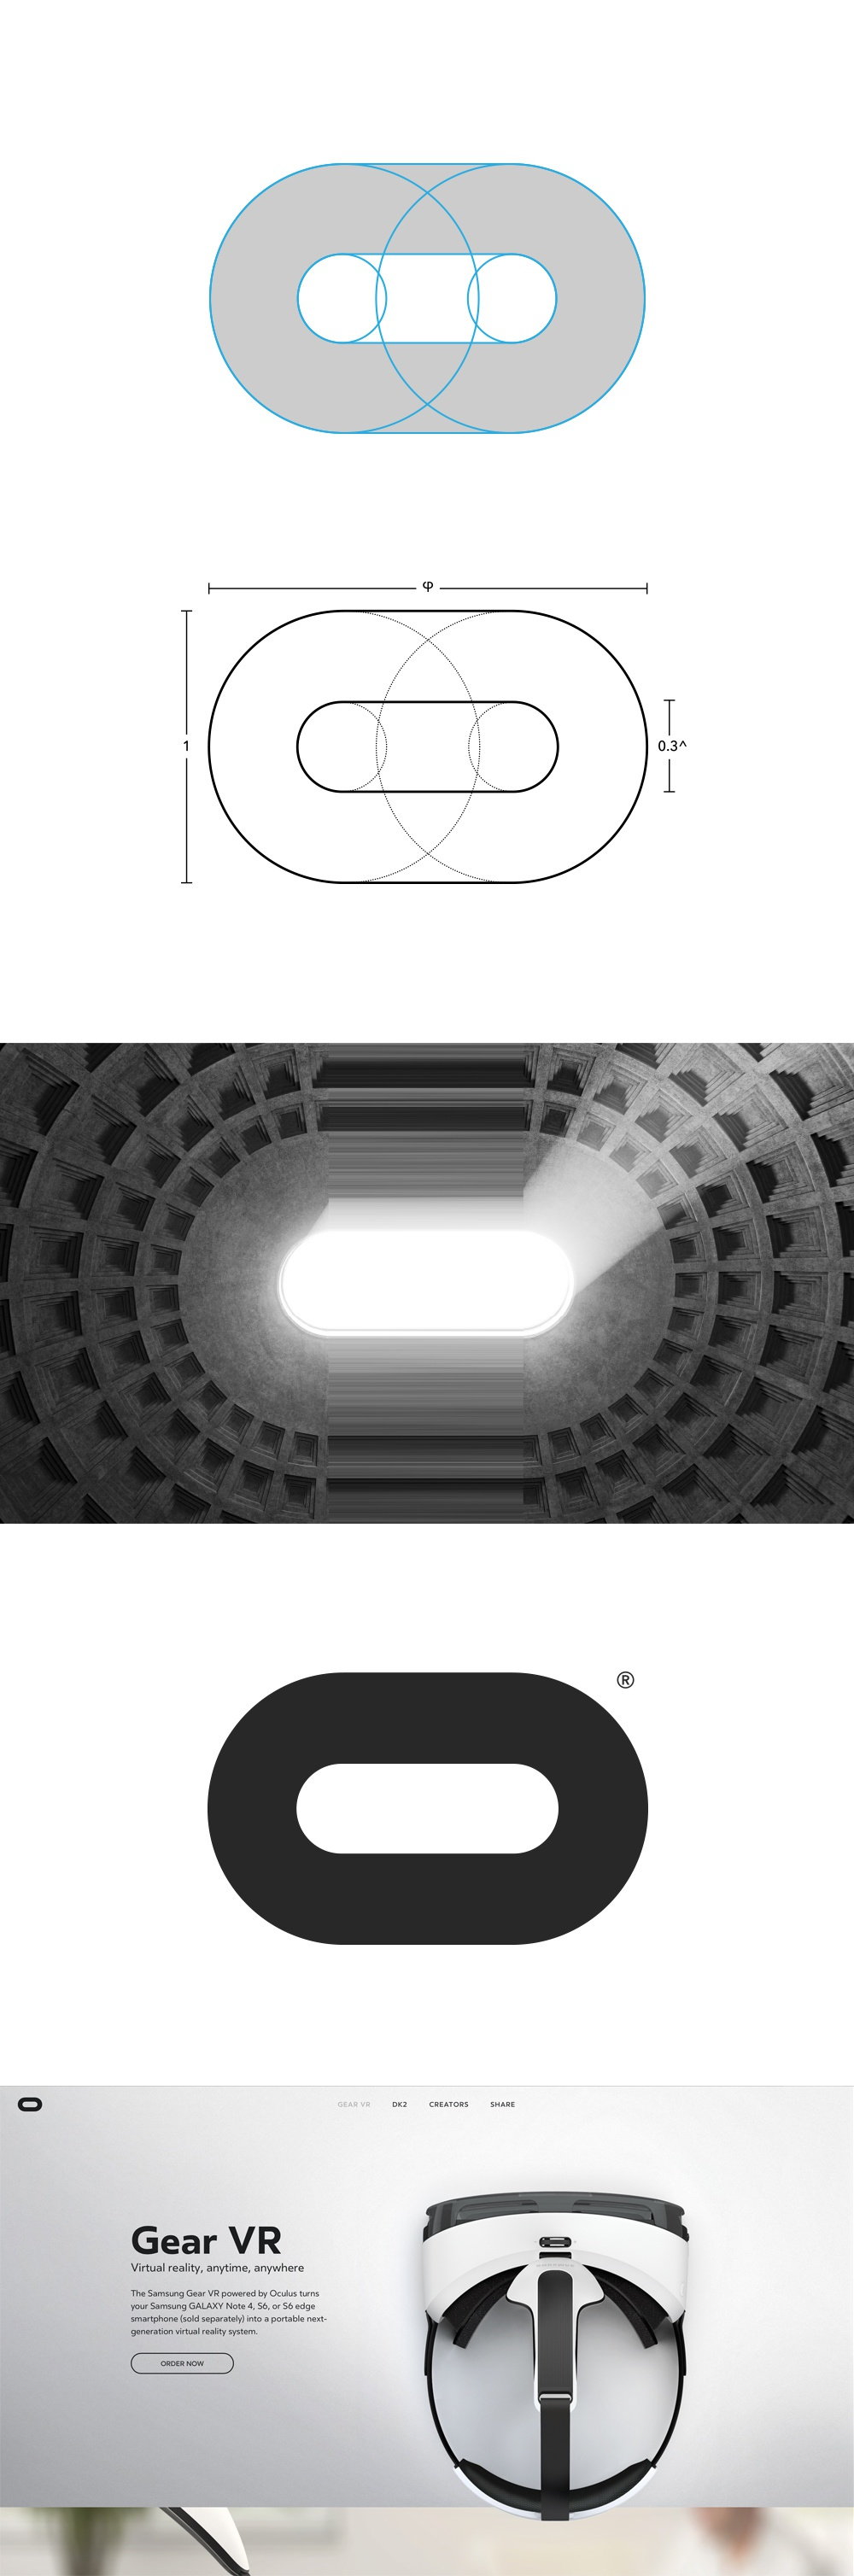 Oculus details